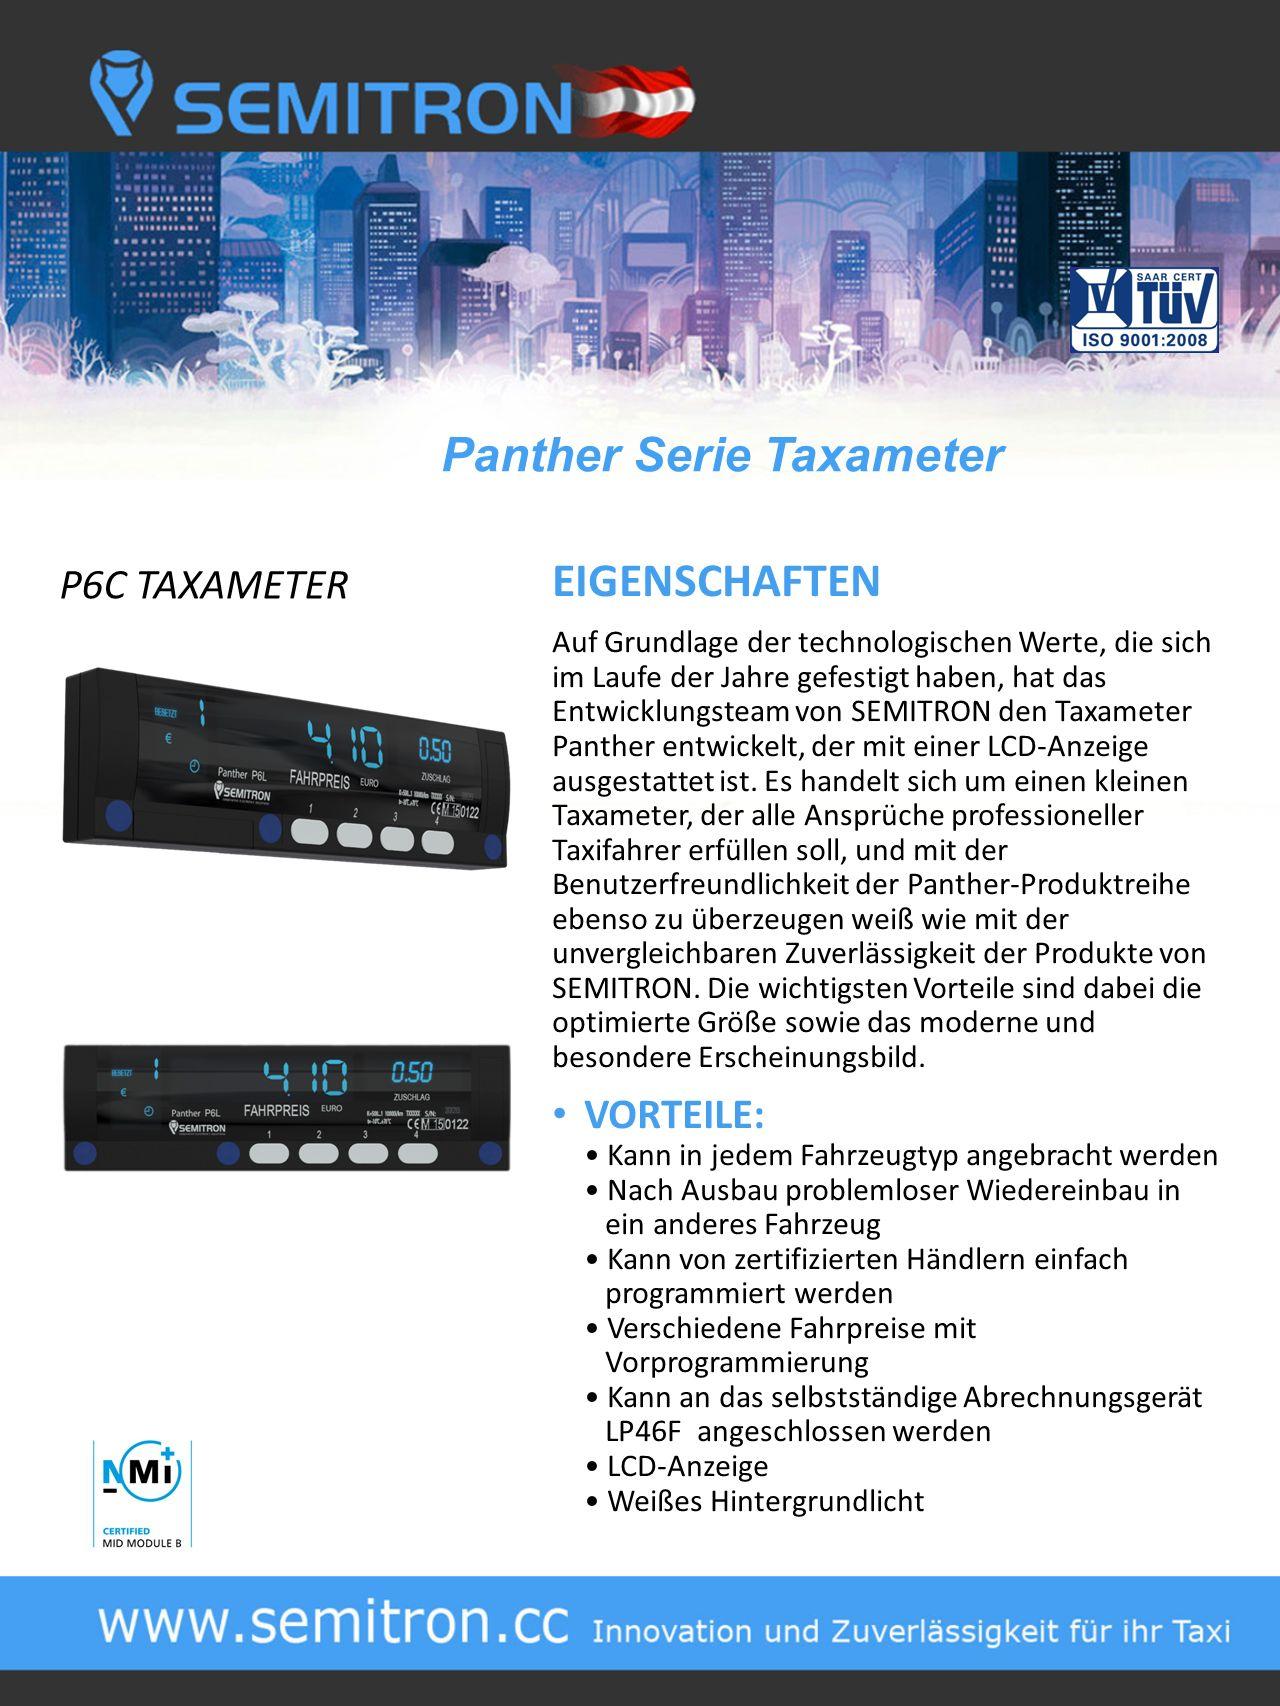 Panther Serie Taxameter